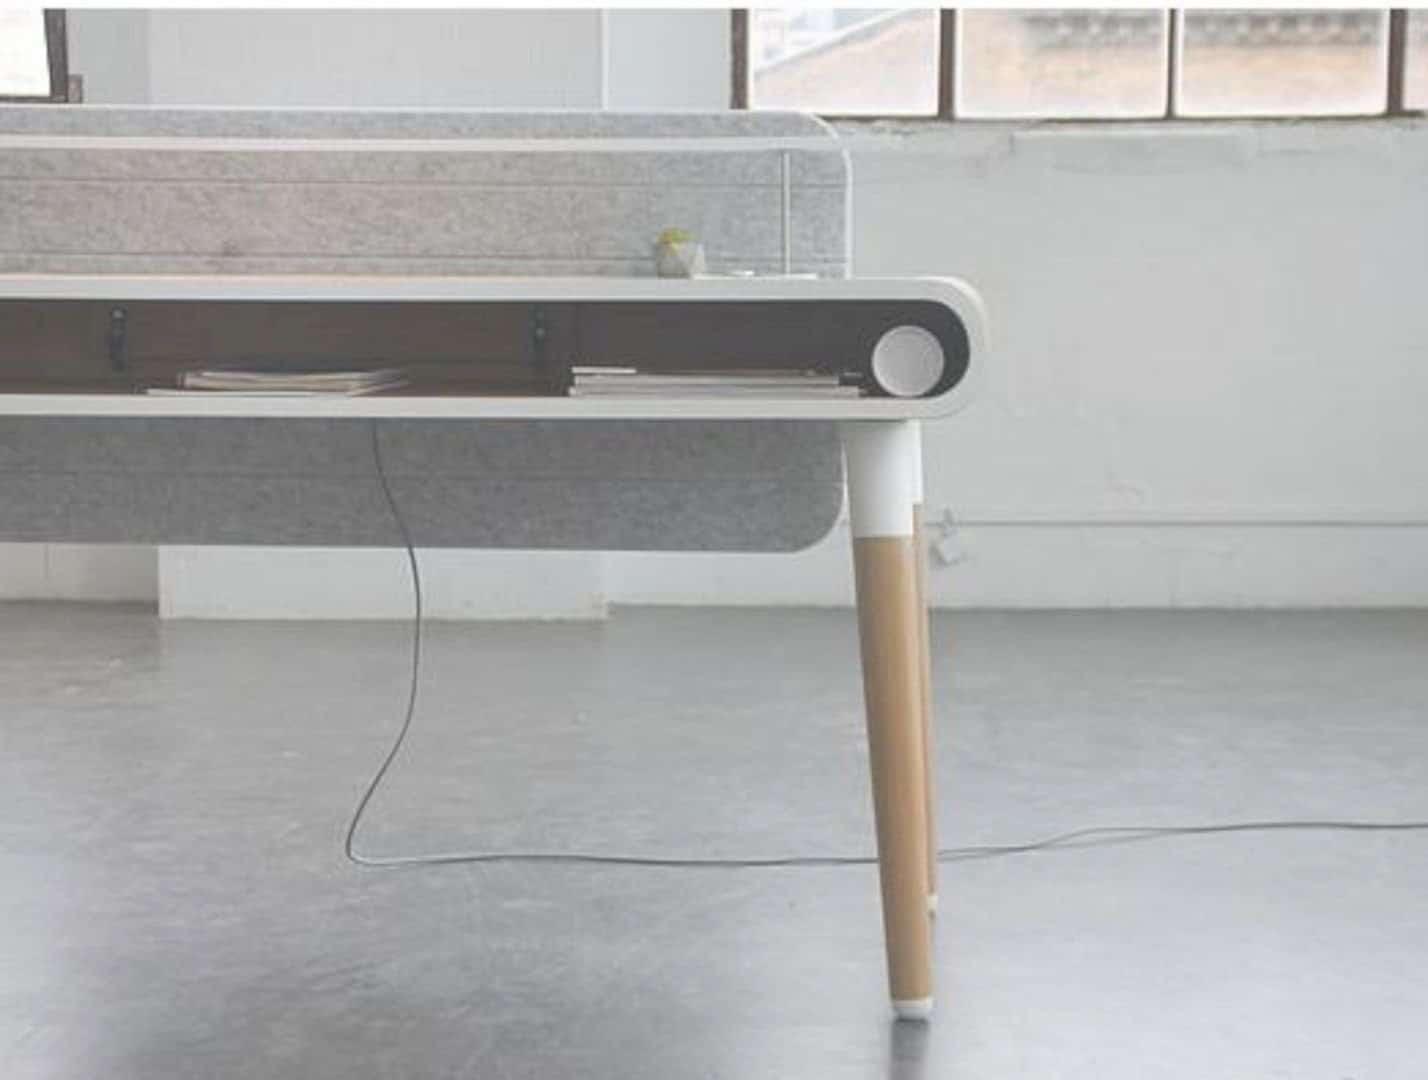 Köllen Eget: A Functional and Smart Work Desk for Your Workspace